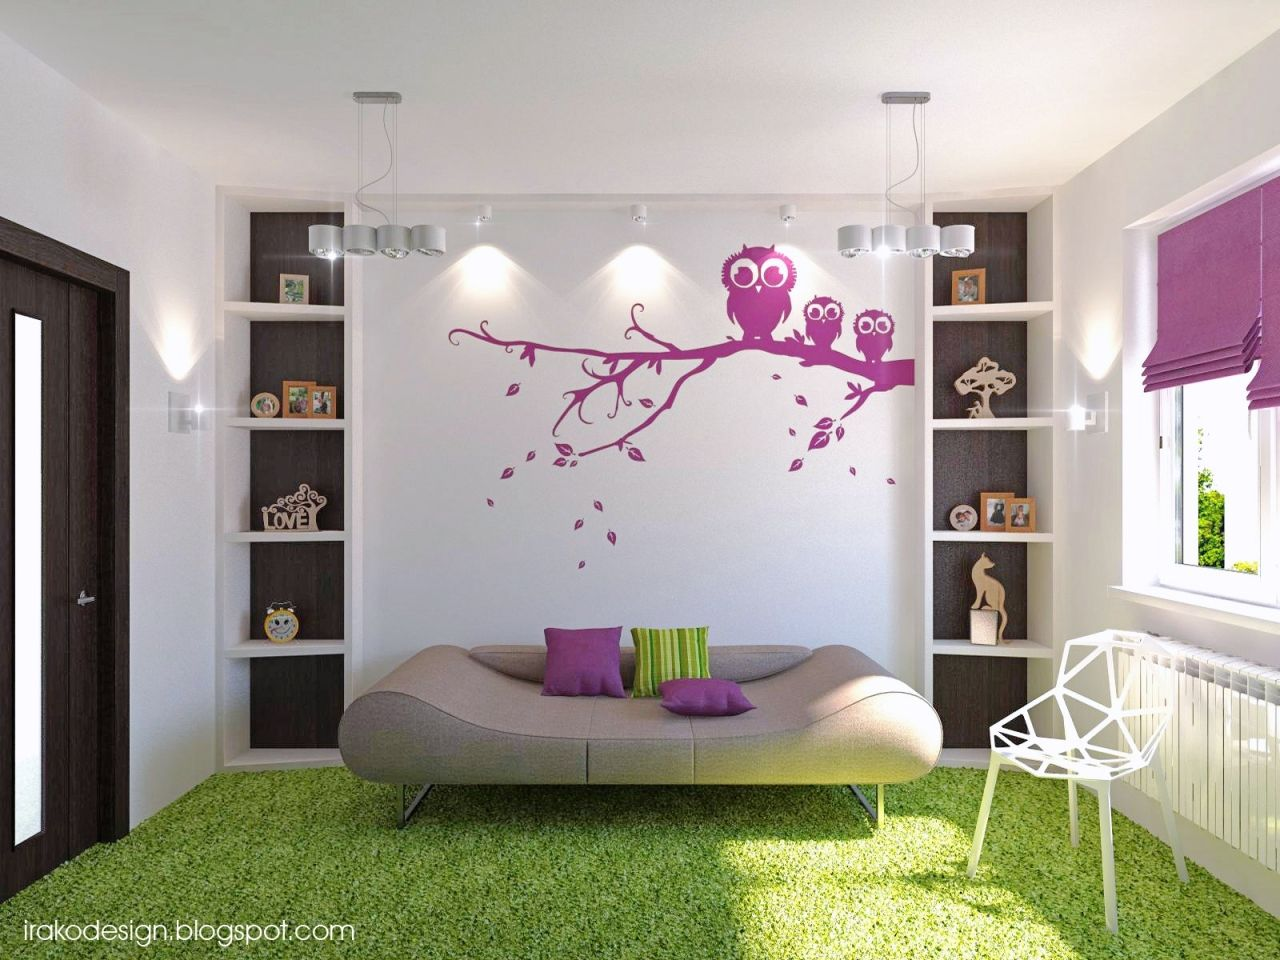 Admirable Teenage Girls Room Design Inspirations Sweet White Teenage Girls Room Decorating With Grey Comfy Bed And Gree Girls Bedroom Meisjeskamer Wandkasten